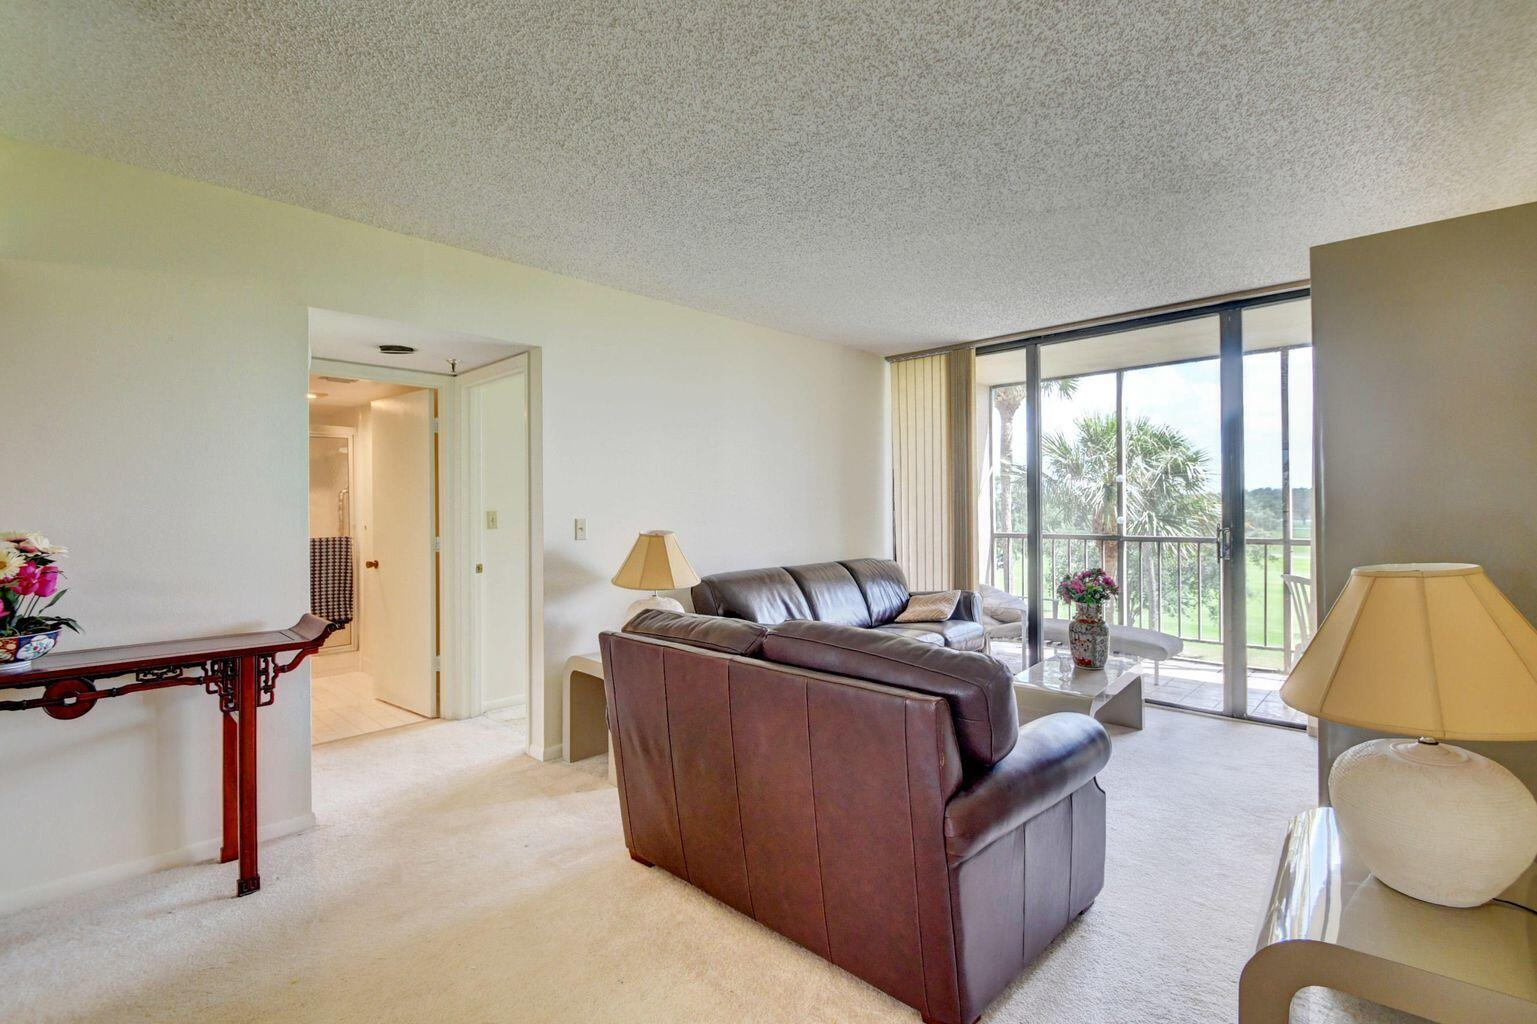 3036 - Living Room